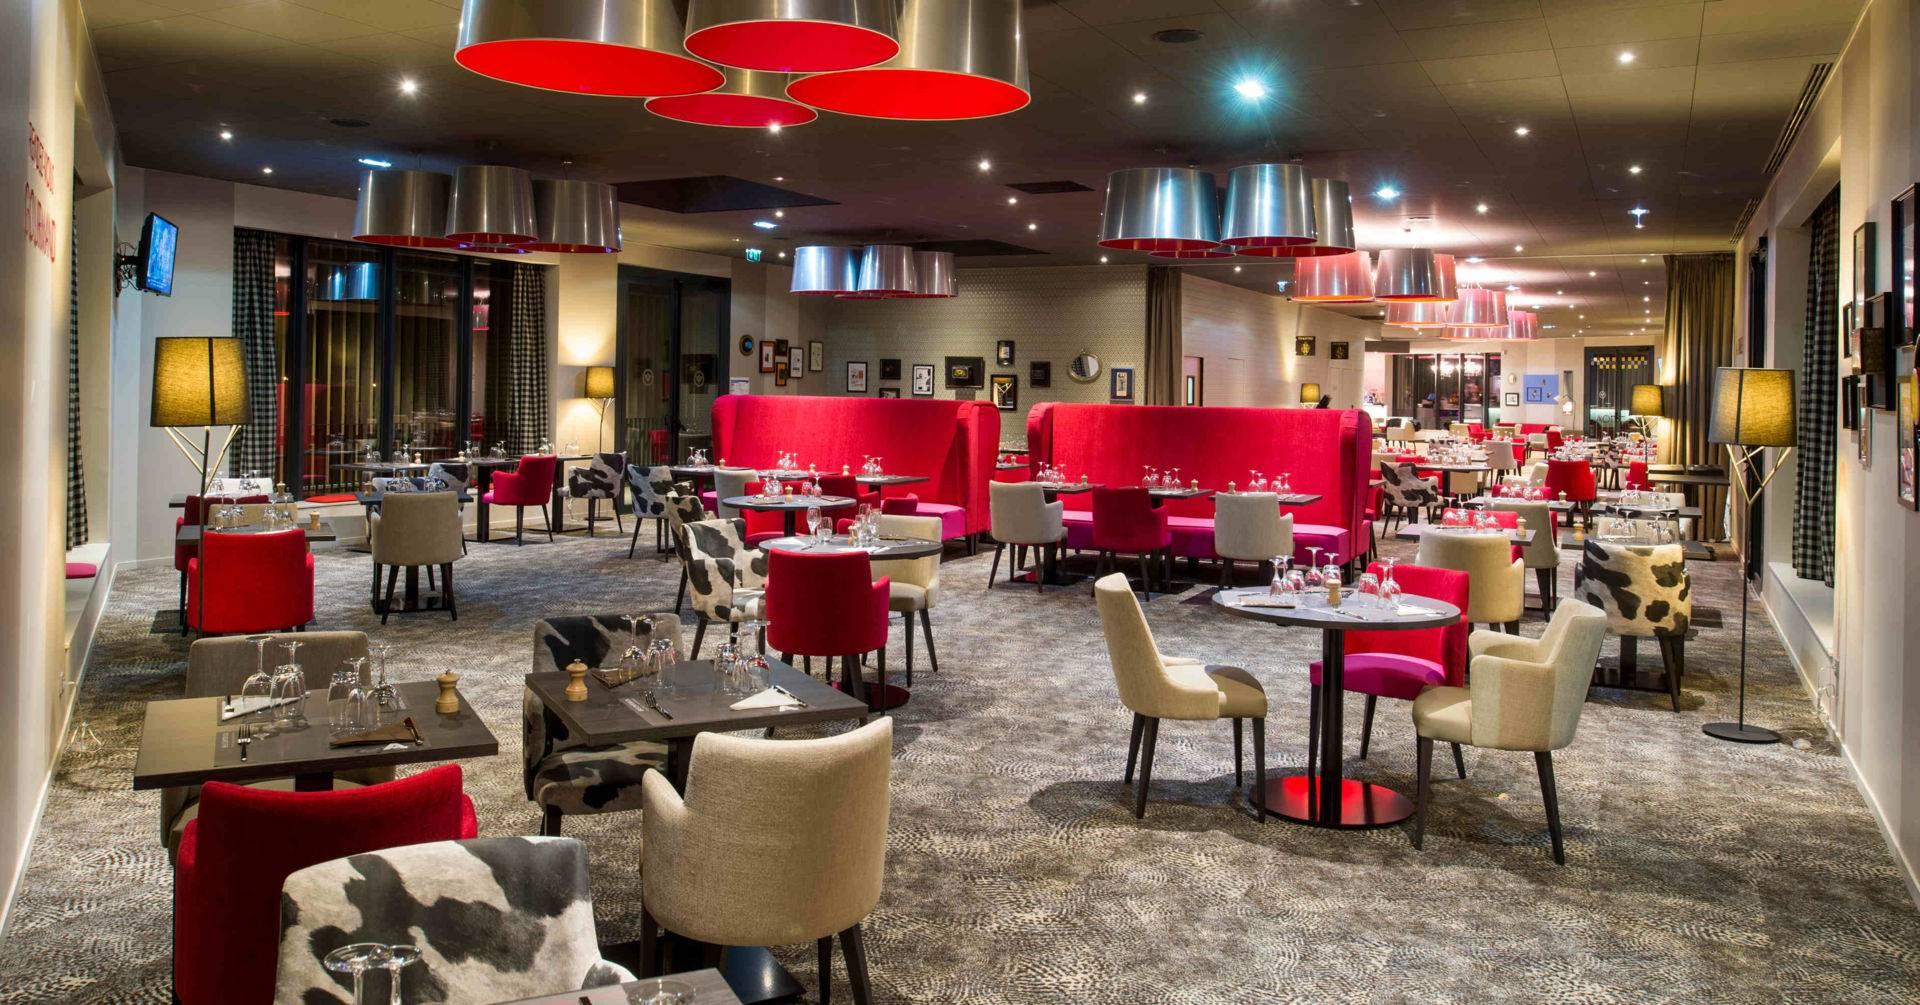 Restaurant casino montier en der poker 180 sng strategy